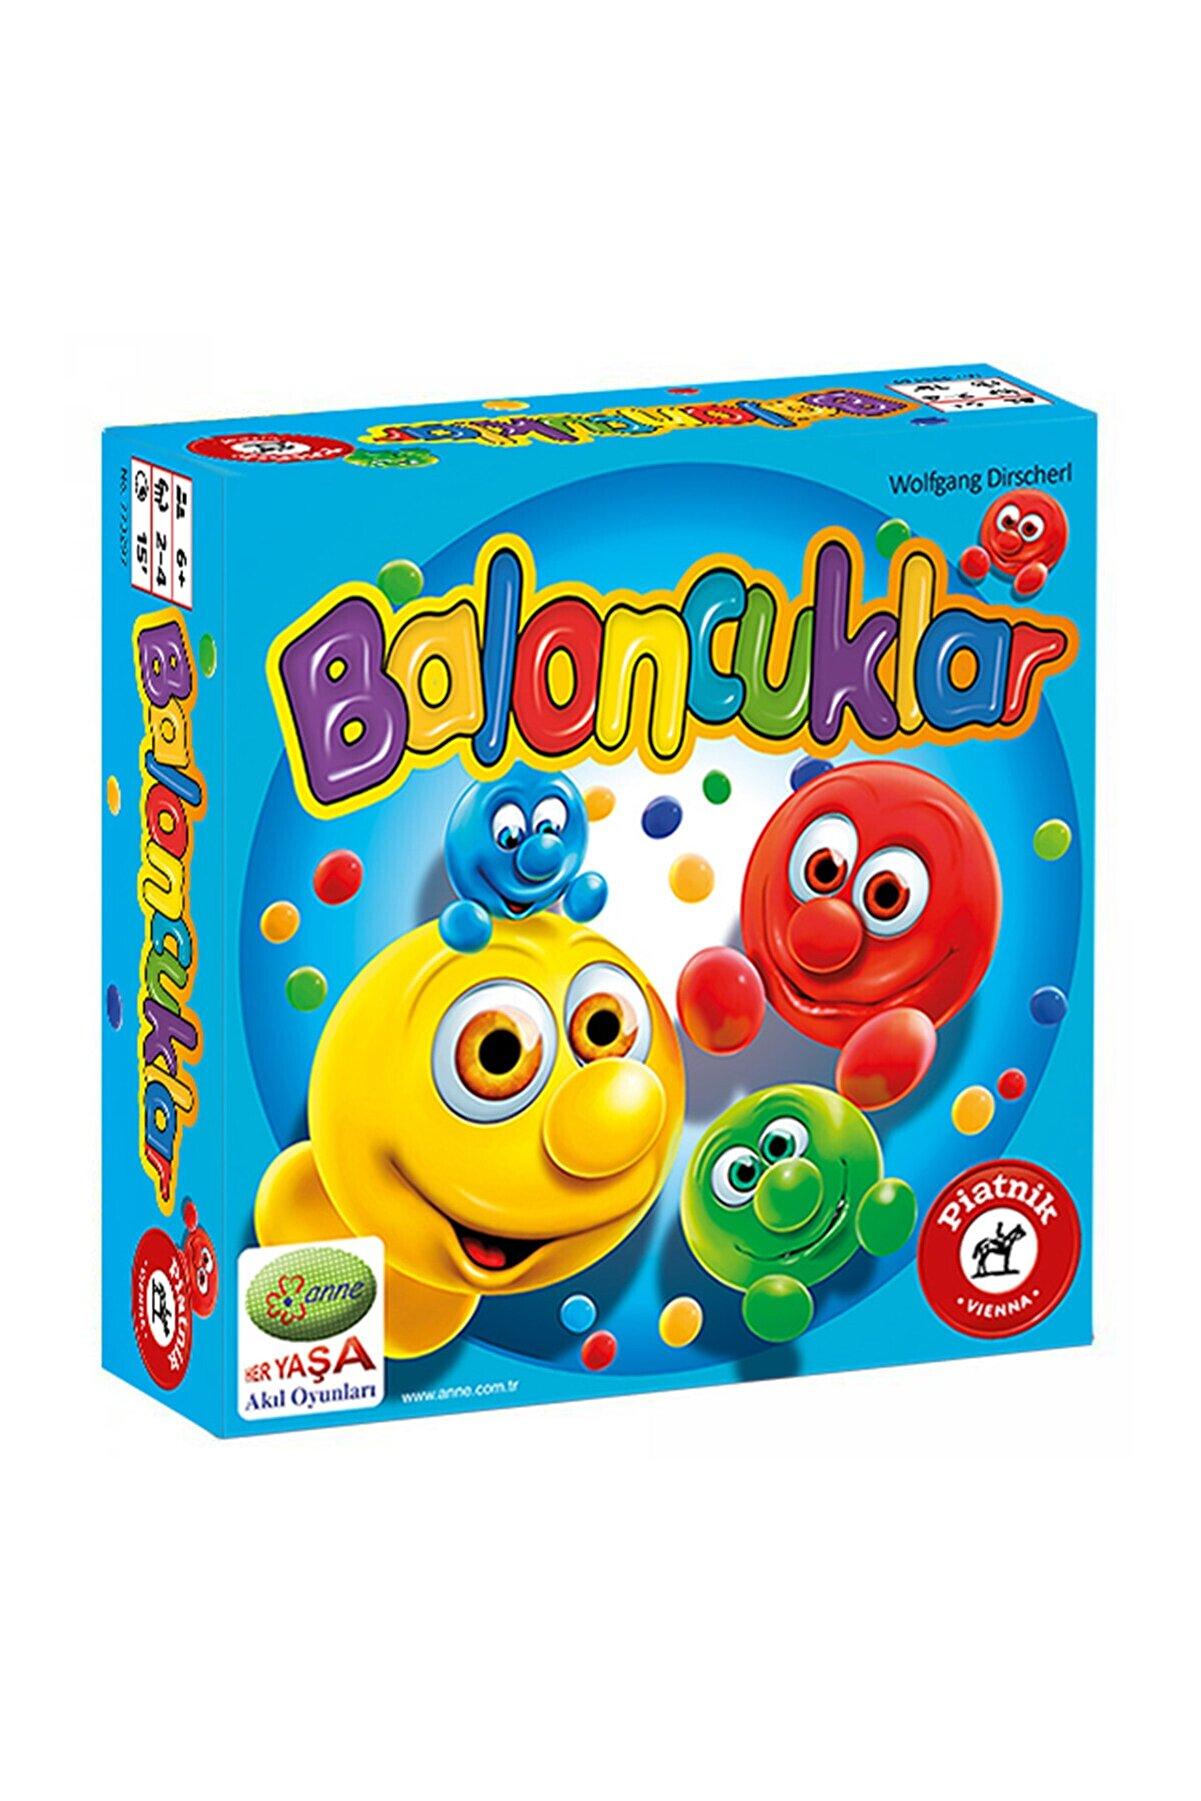 Piatnik Baloncuklar (Bubbles) - Türkçe /